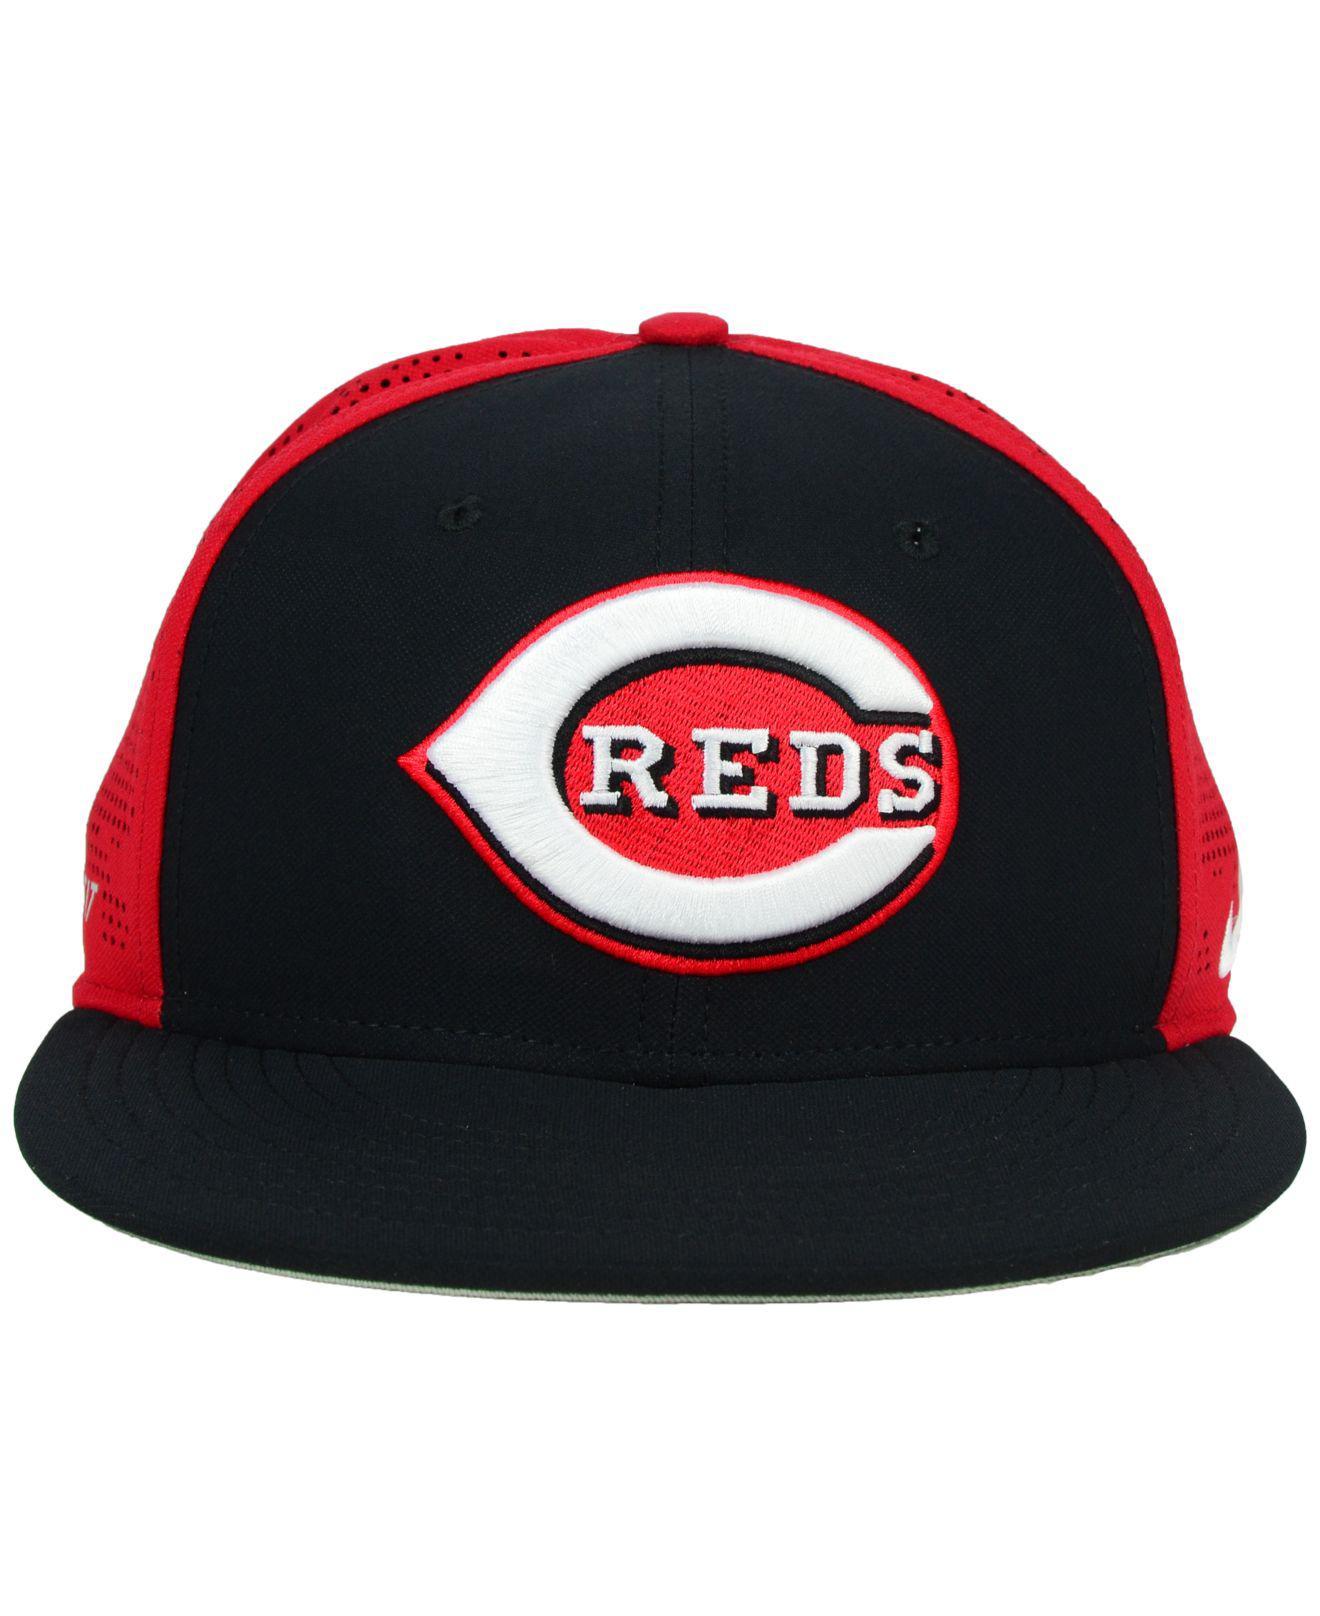 low priced 682a7 dc031 Lyst - Nike Cincinnati Reds True Vapor Swoosh Flex Cap in Black for Men